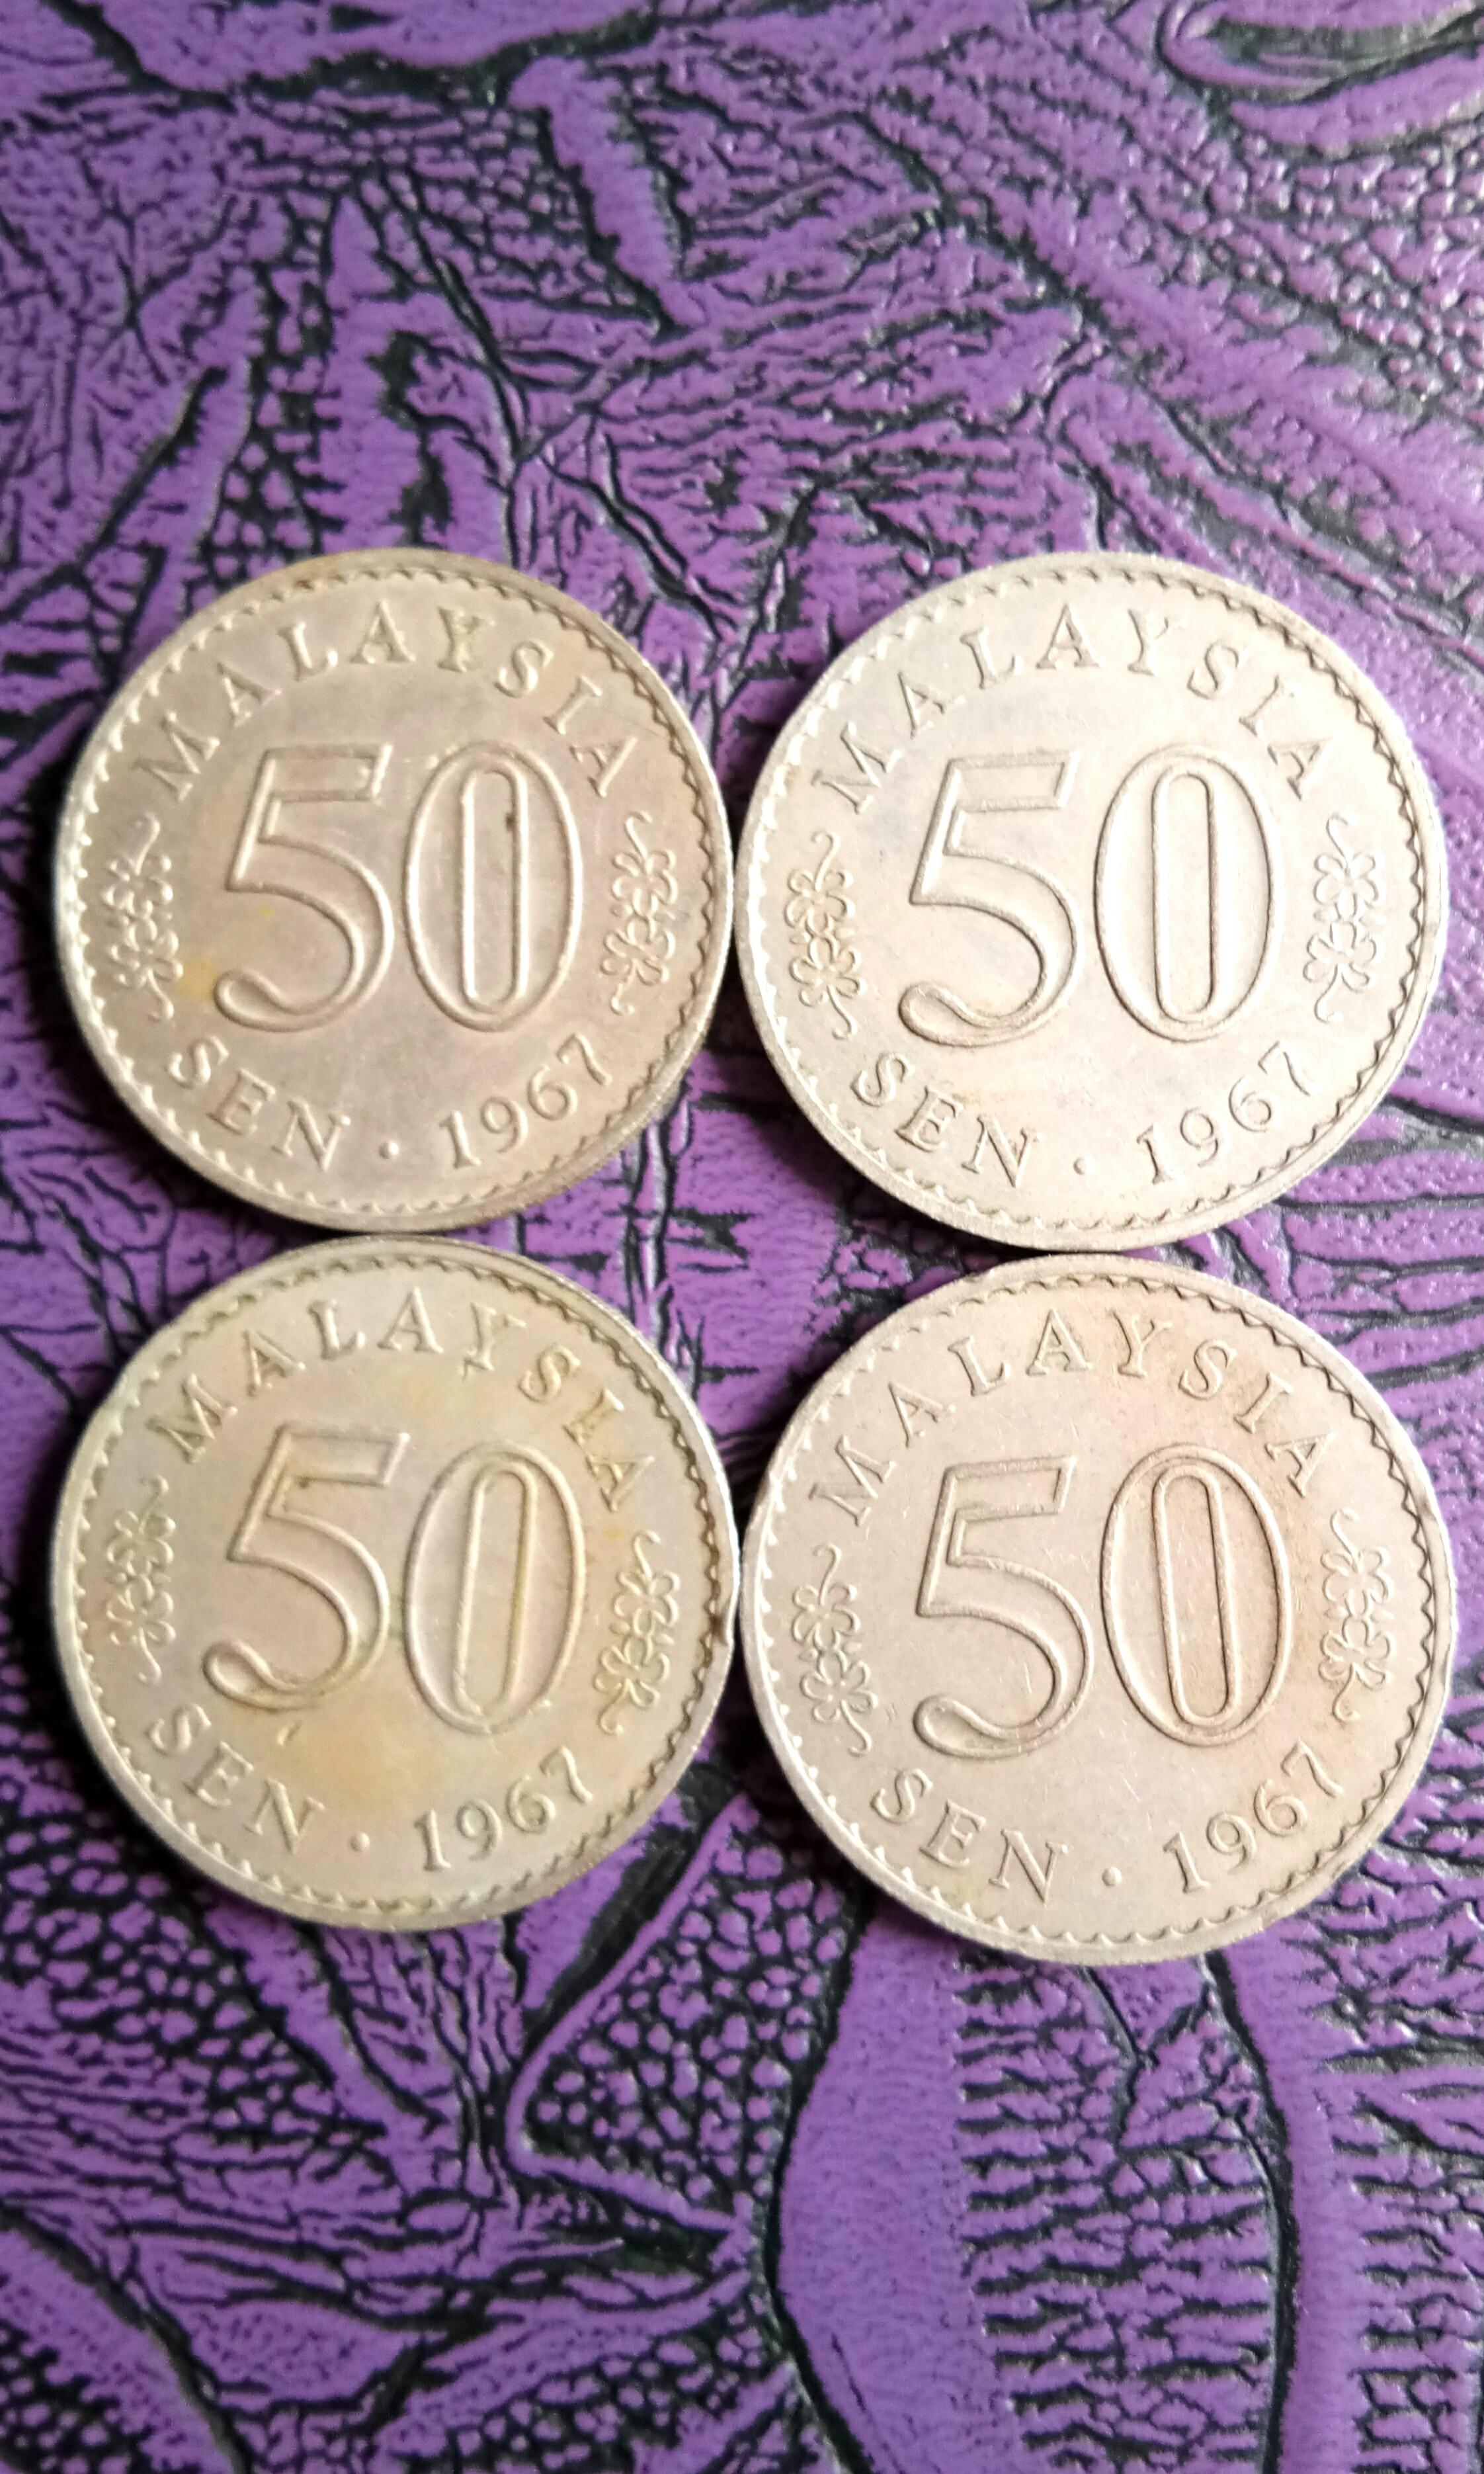 1967 Bank Negara Malaysia Parlimen Wang Syilling Lama 50 sen Currency 50¢ Old Coin Per Piece Selling RM 7